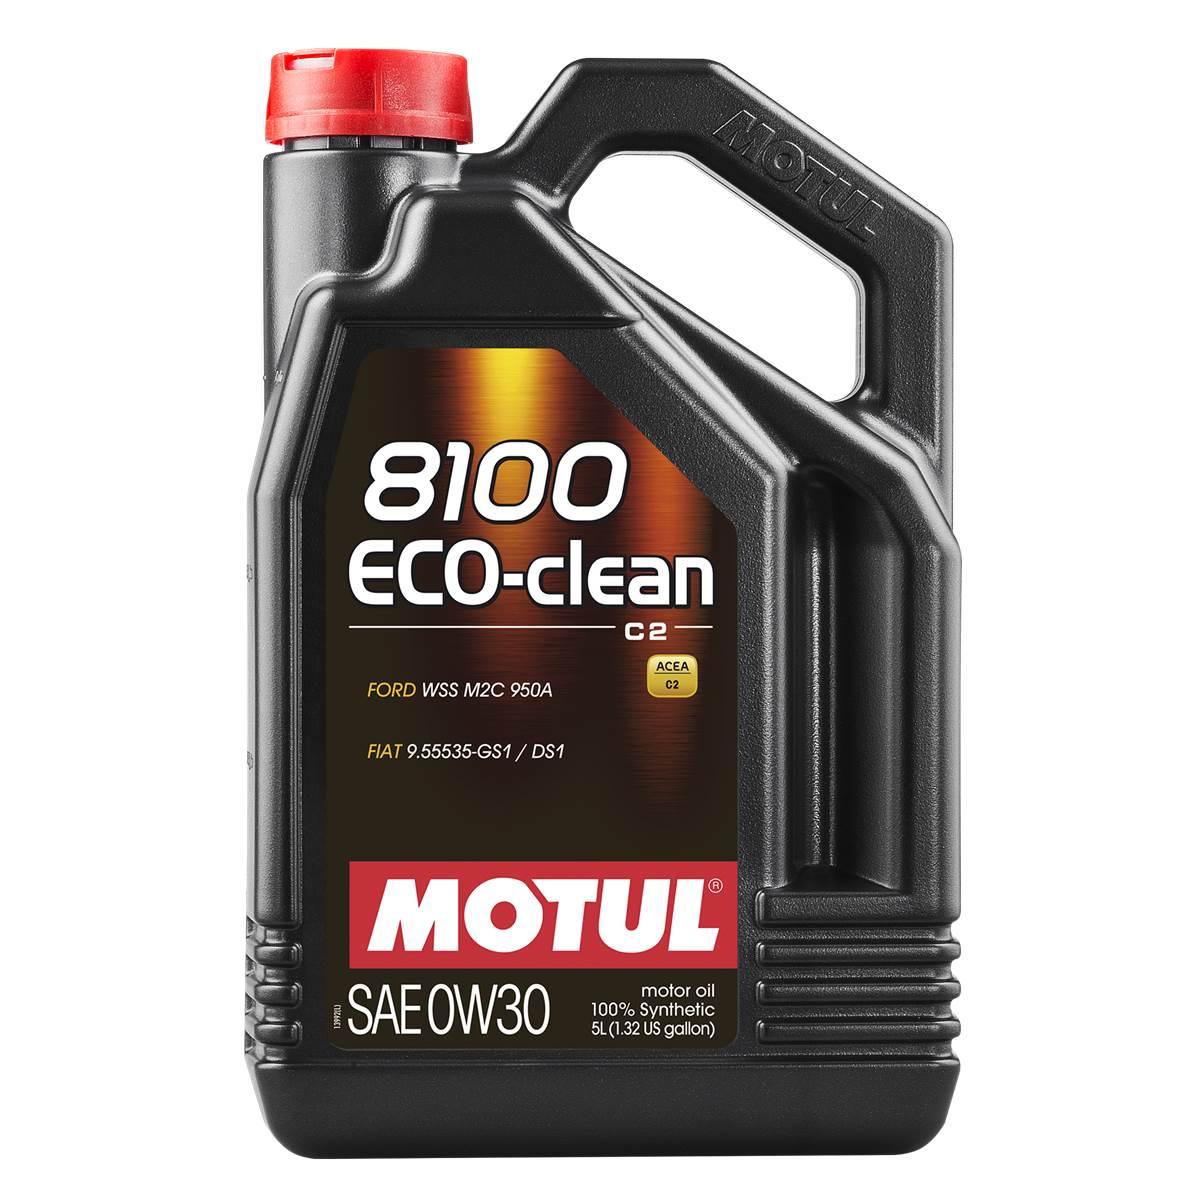 Huile moteur MOTUL 8100 EcoClean Essence/Diesel 0W30 5L